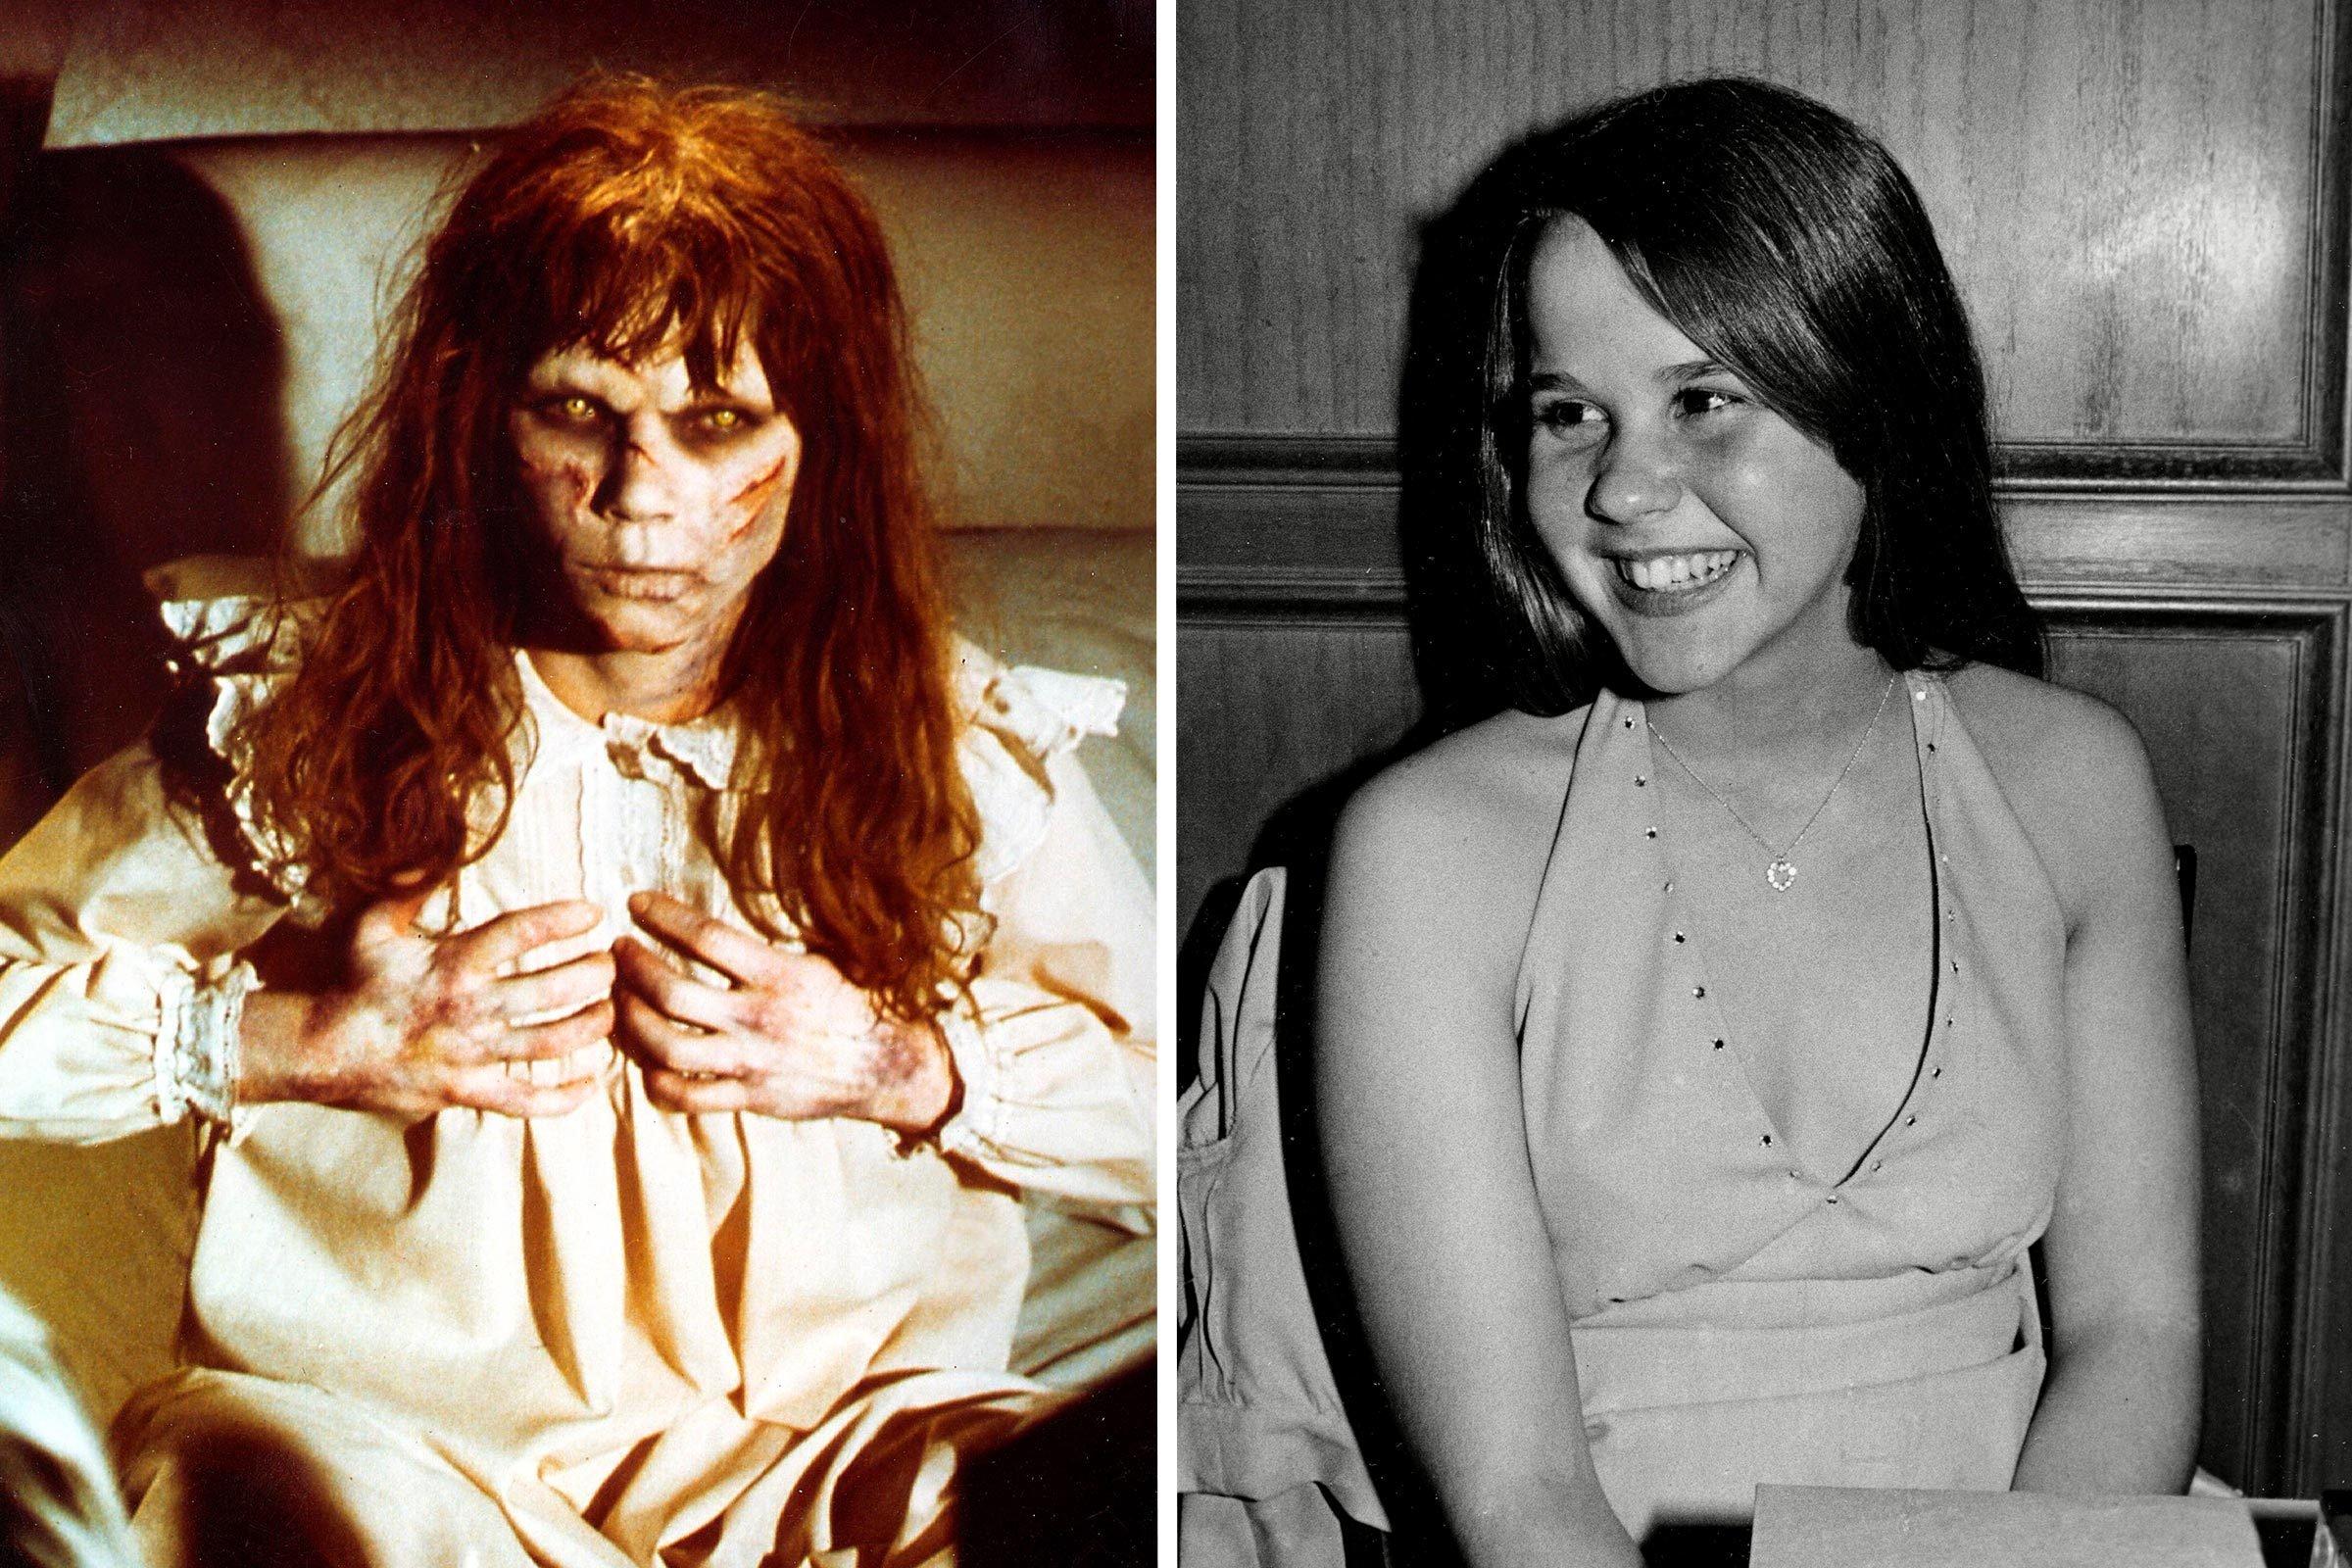 Regan MacNeil The Exorcist